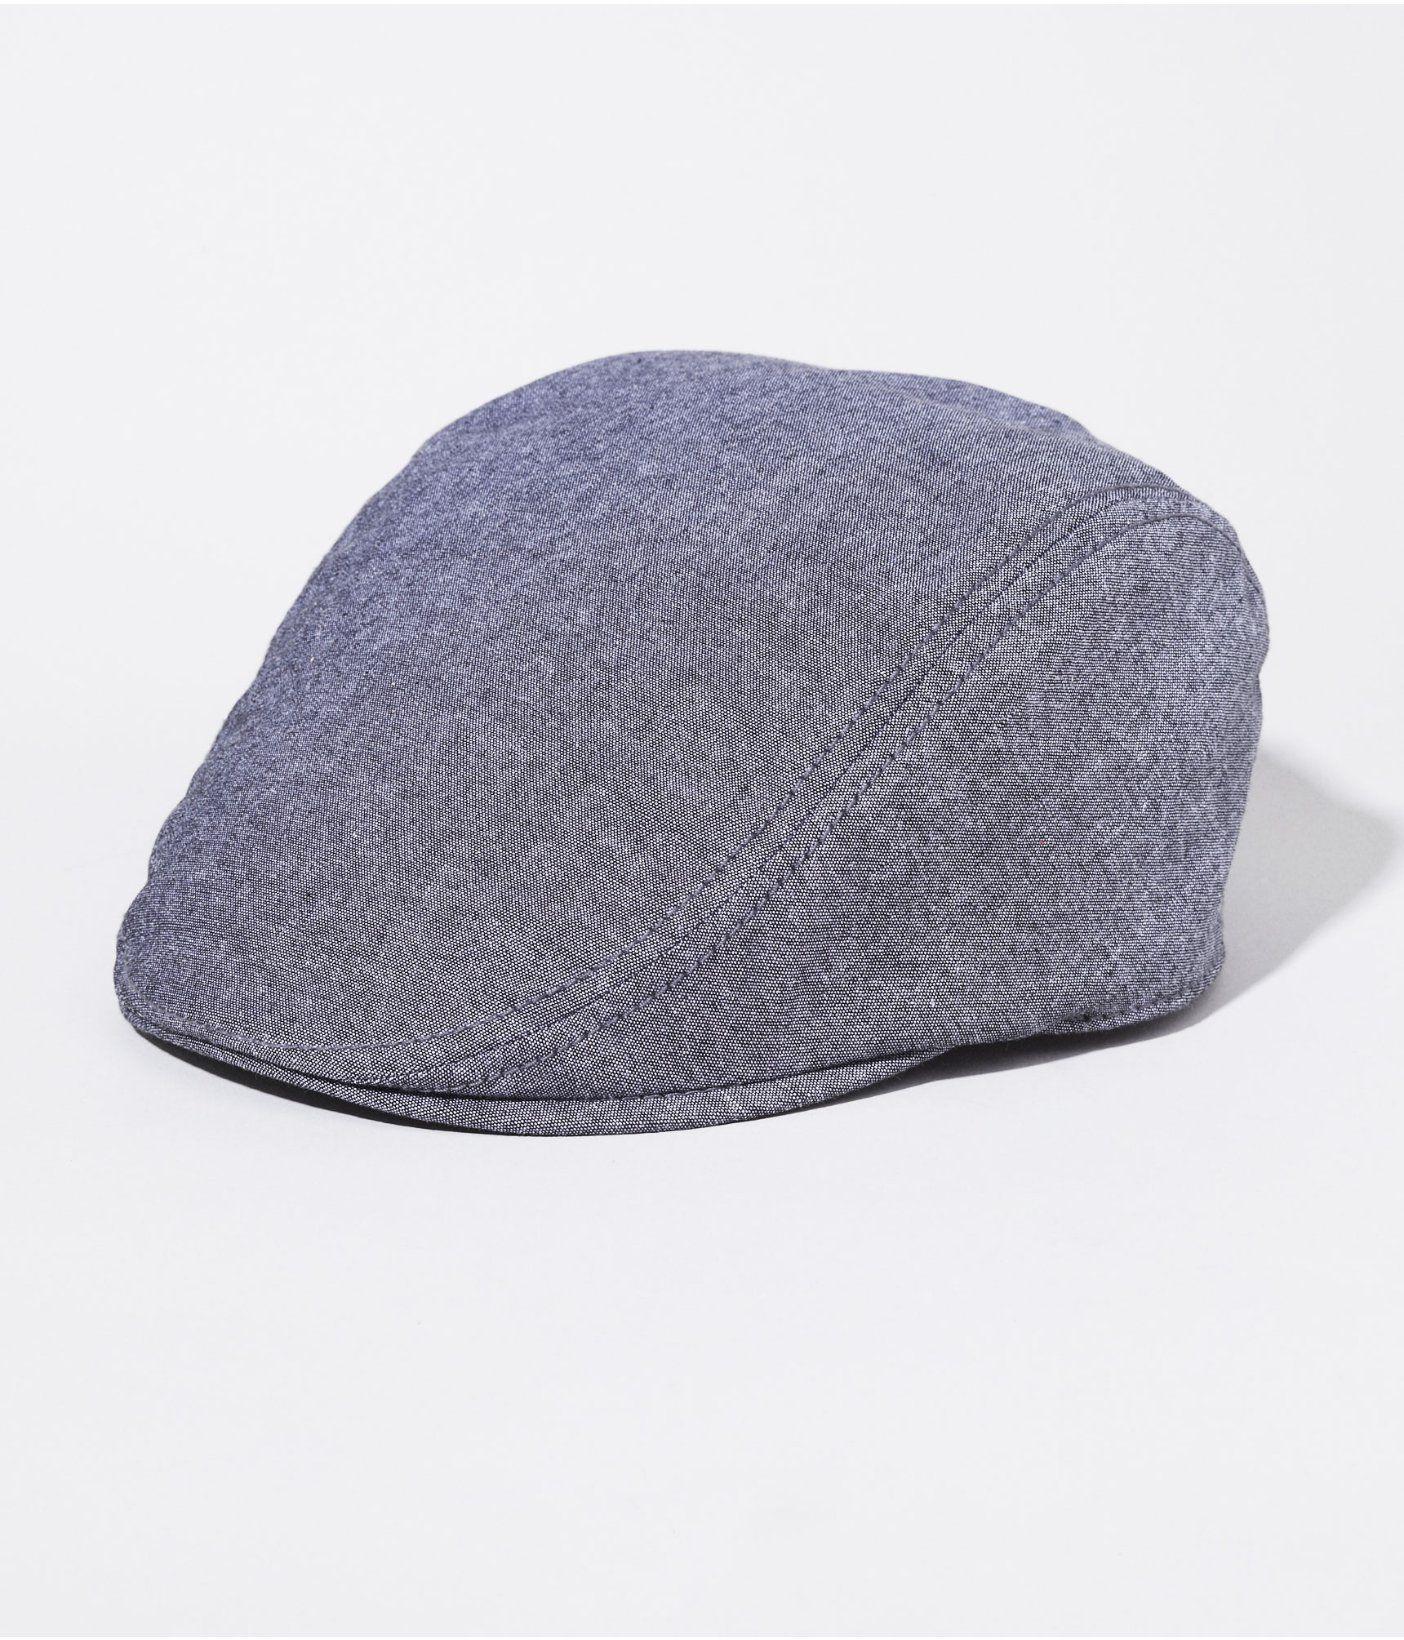 378b006e CHAMBRAY DRIVER HAT -- SM Express Men, Flat Cap, Chambray, Girly Things